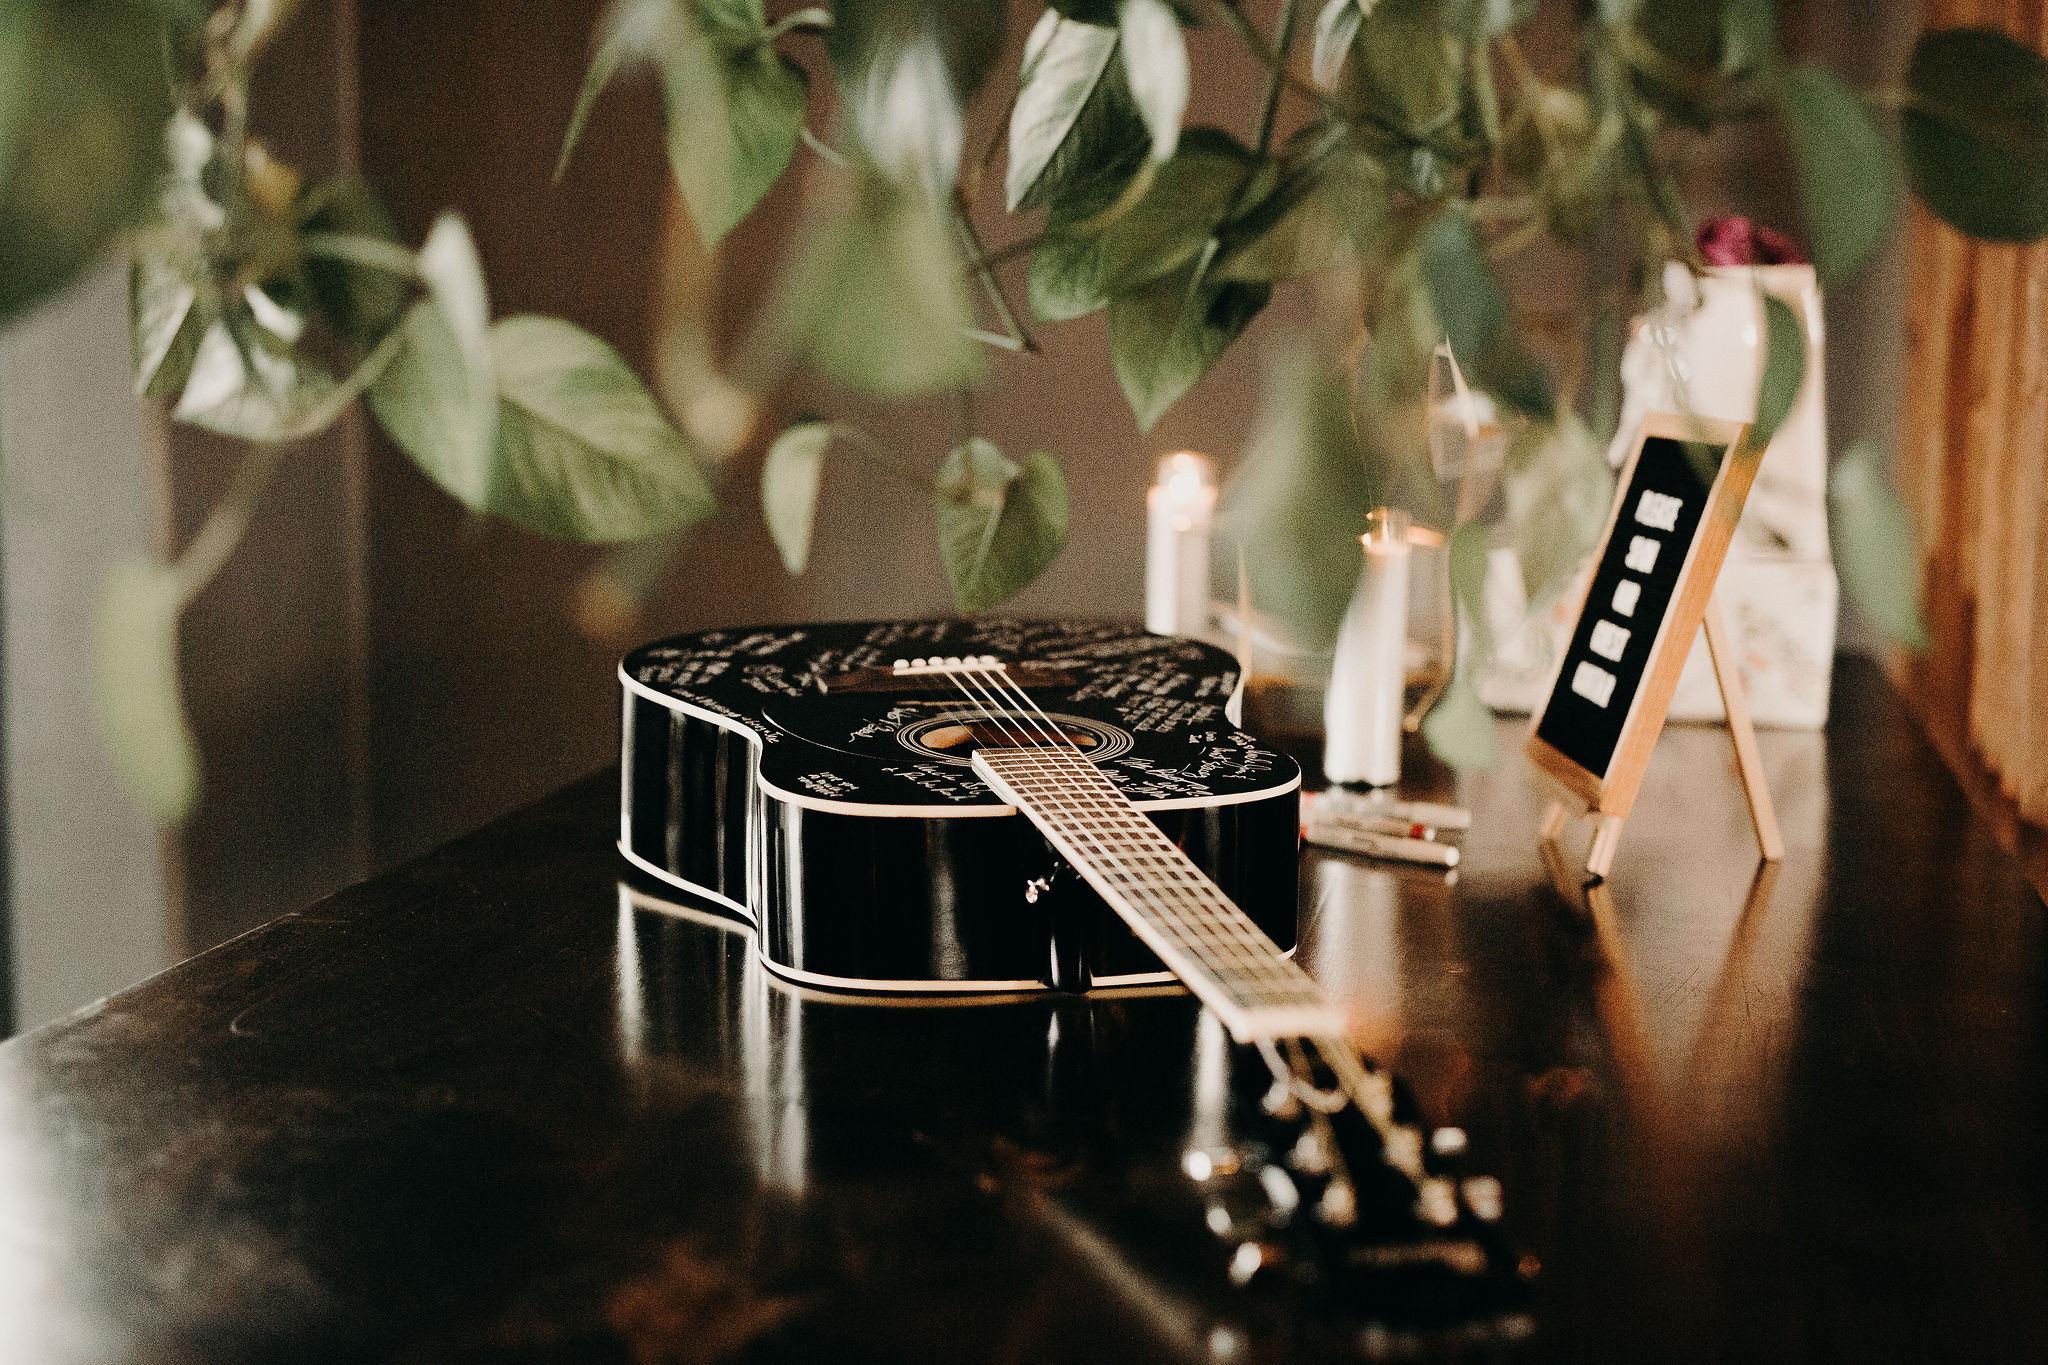 guitar guest book table.jpg